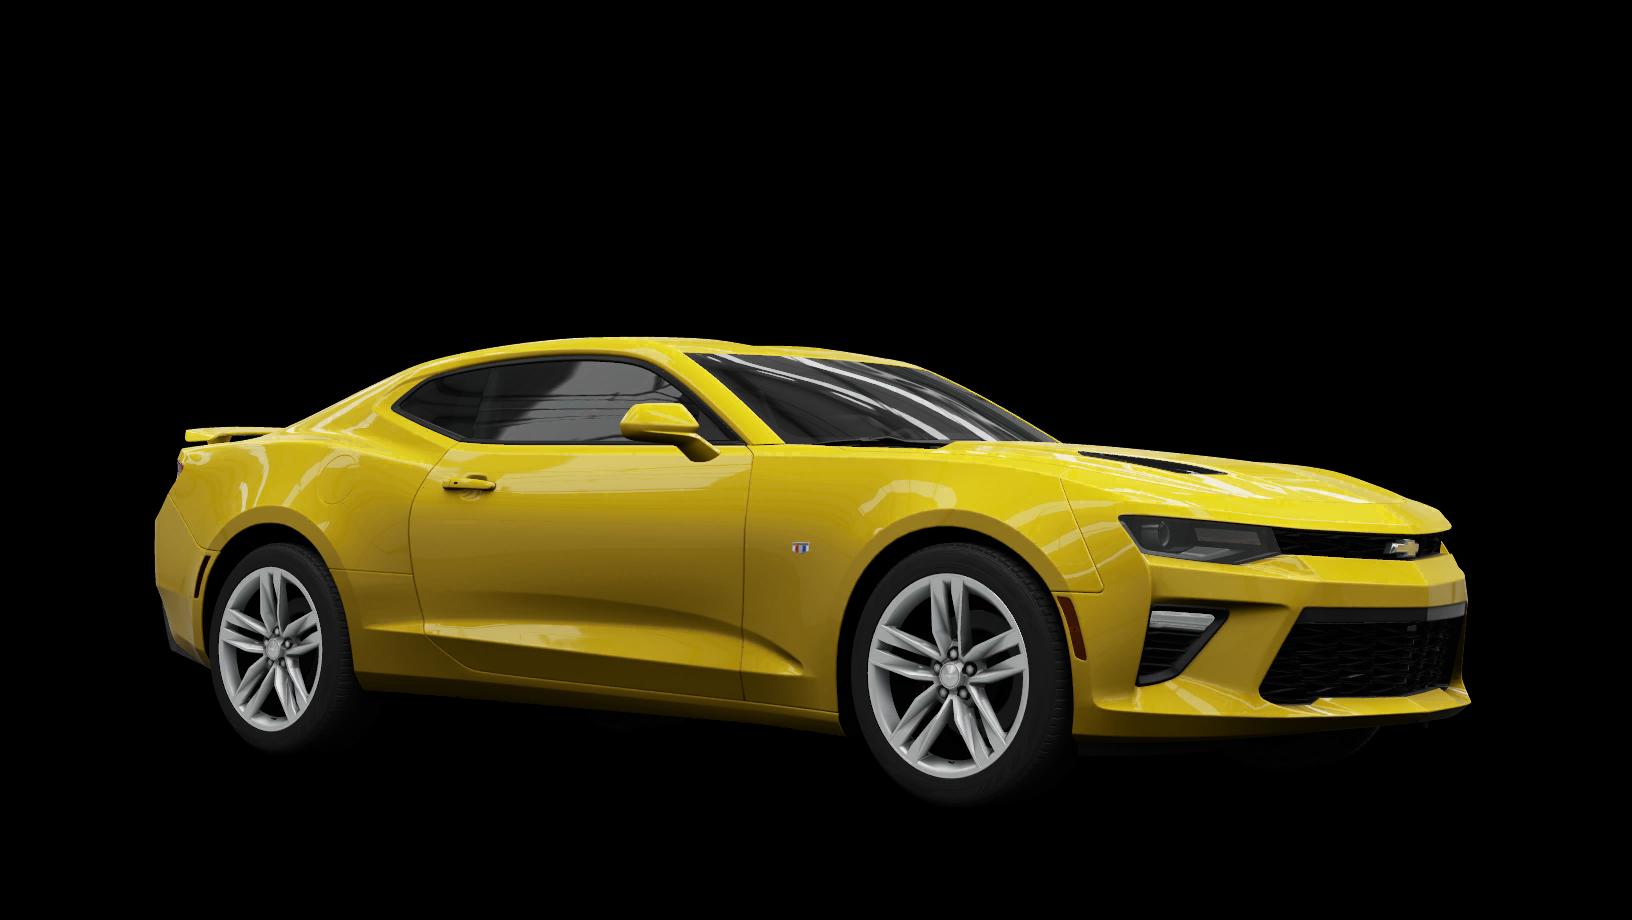 Kelebihan Chevrolet Camaro Ss Tangguh